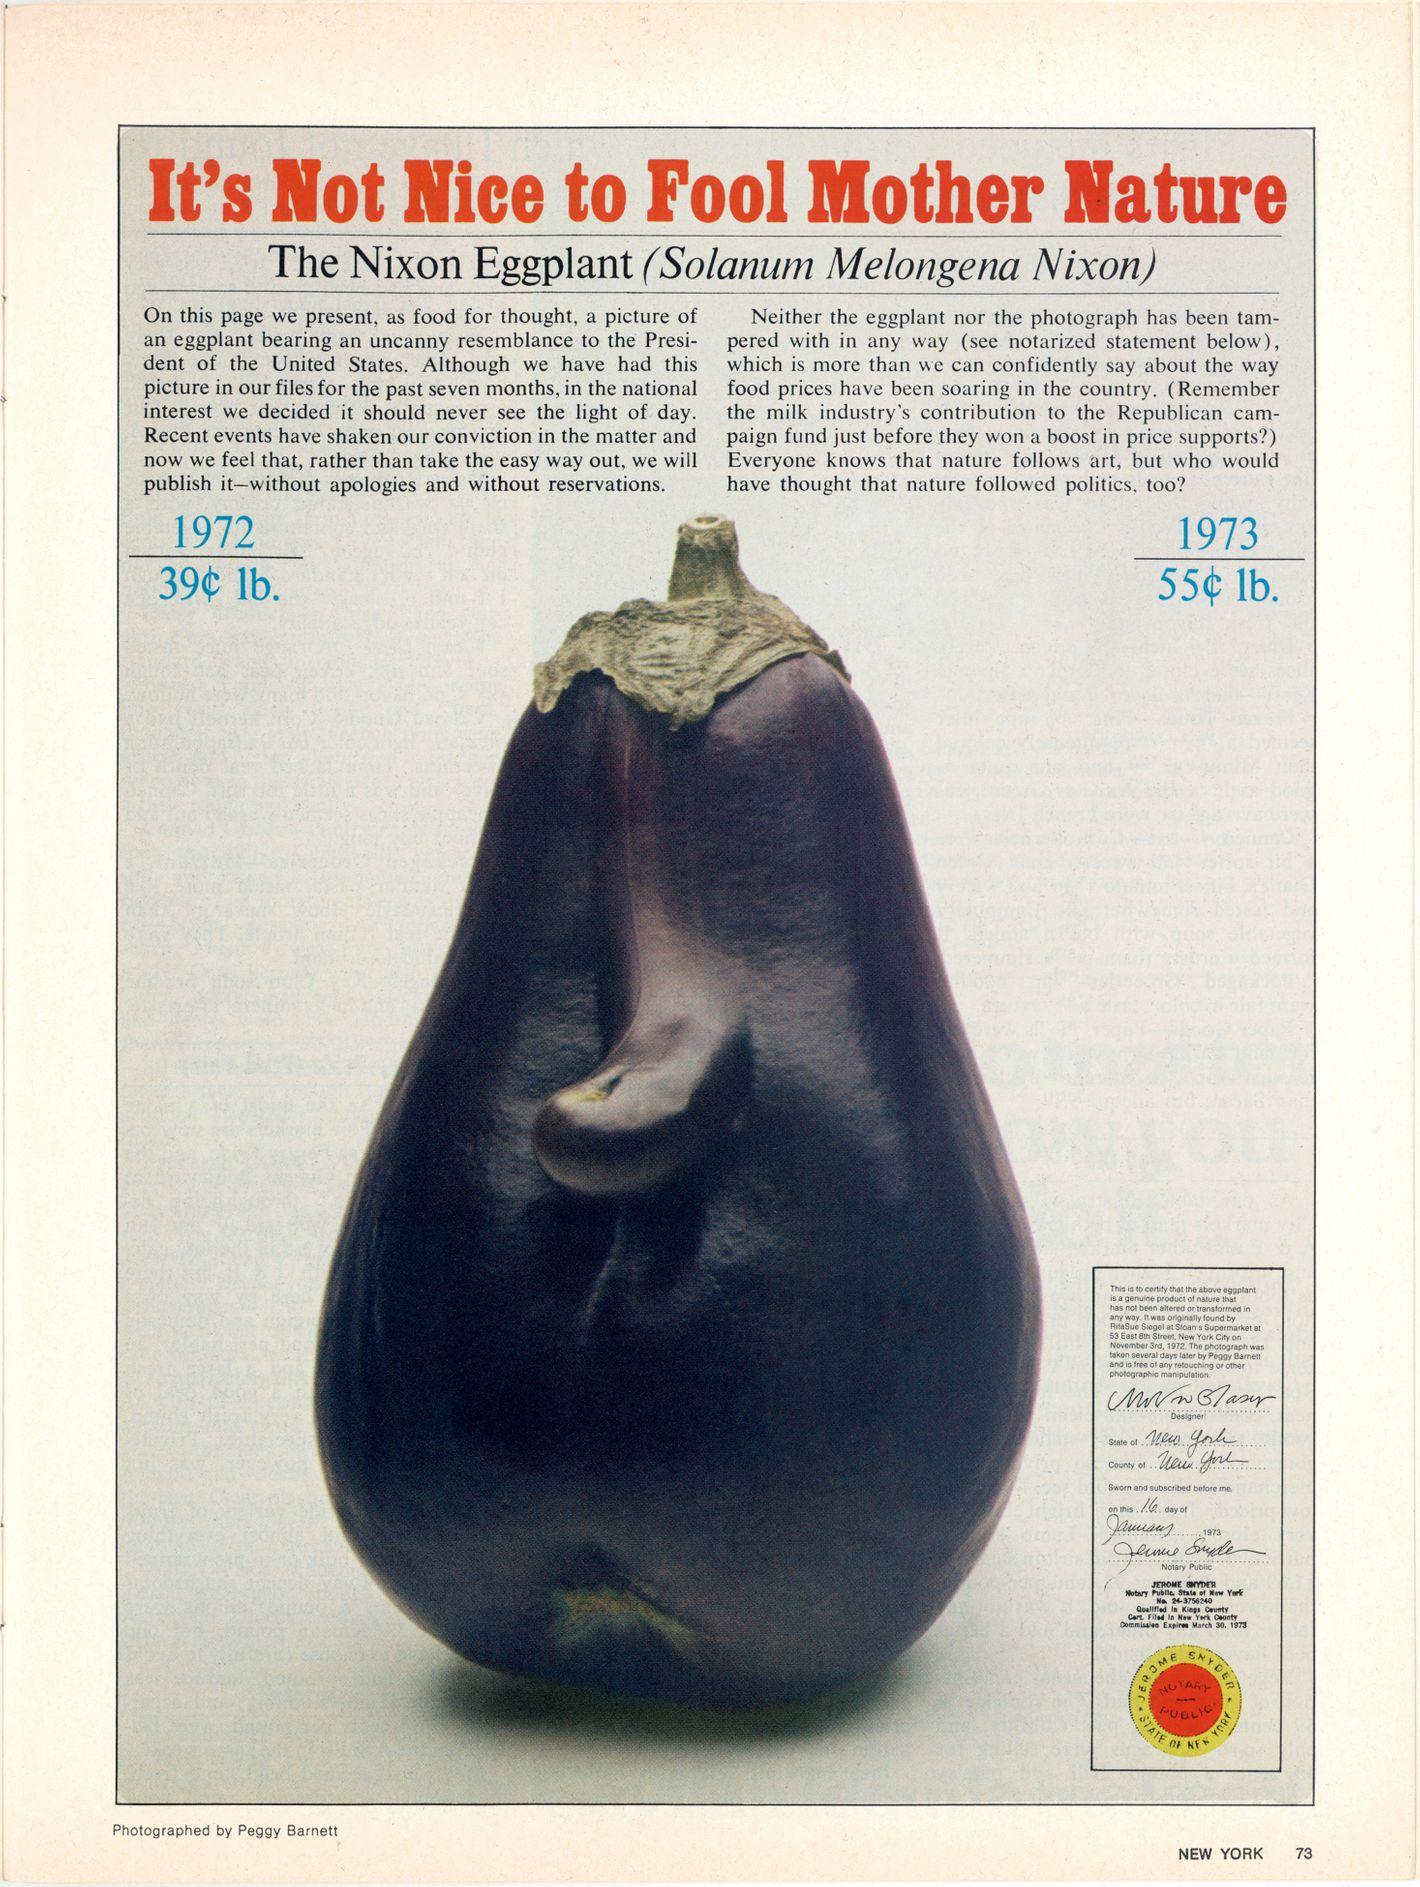 The Richard Nixon Eggplant by Peggy Barnett